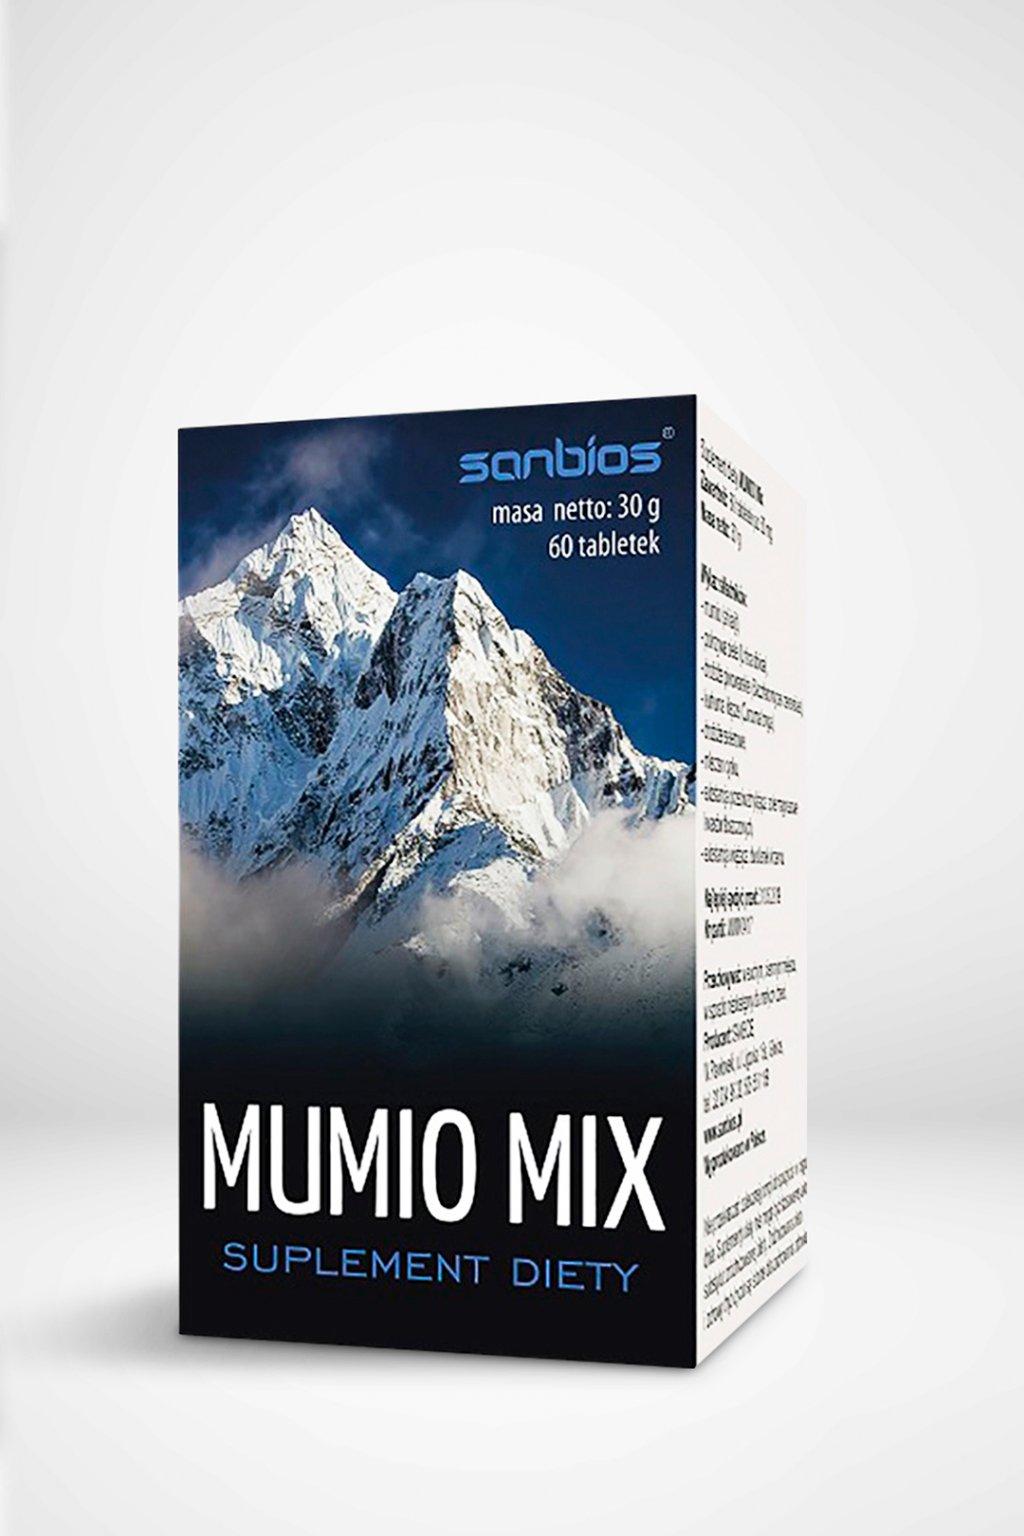 NZ Mumio mix 1080x1620px